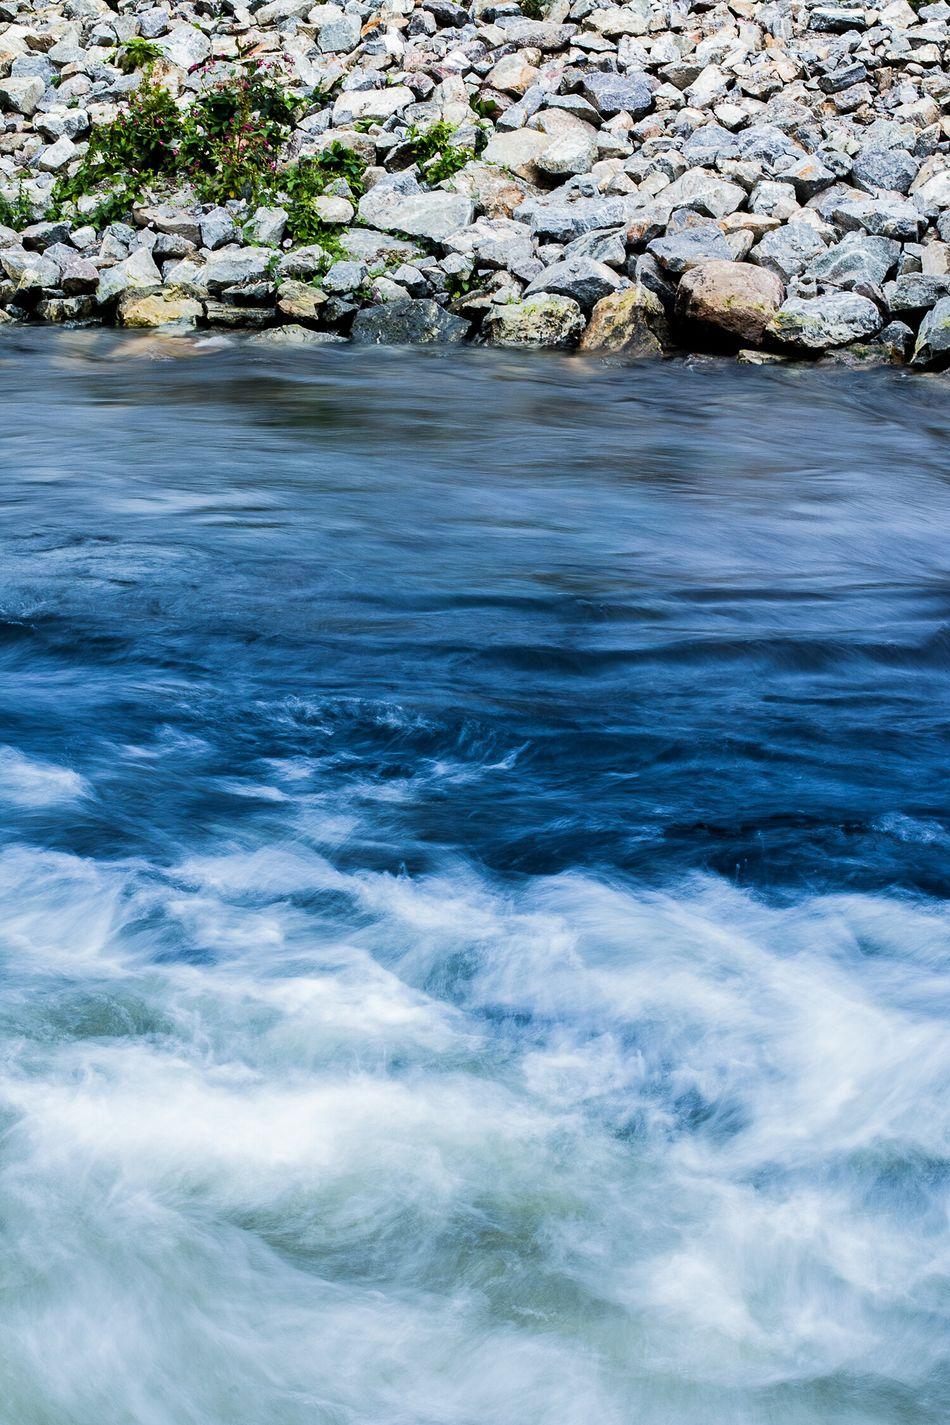 Hello World Nofilter Nature Folowme Aoutmn Folowforfollow Hudiksvall Butiful Blue Wather Stones